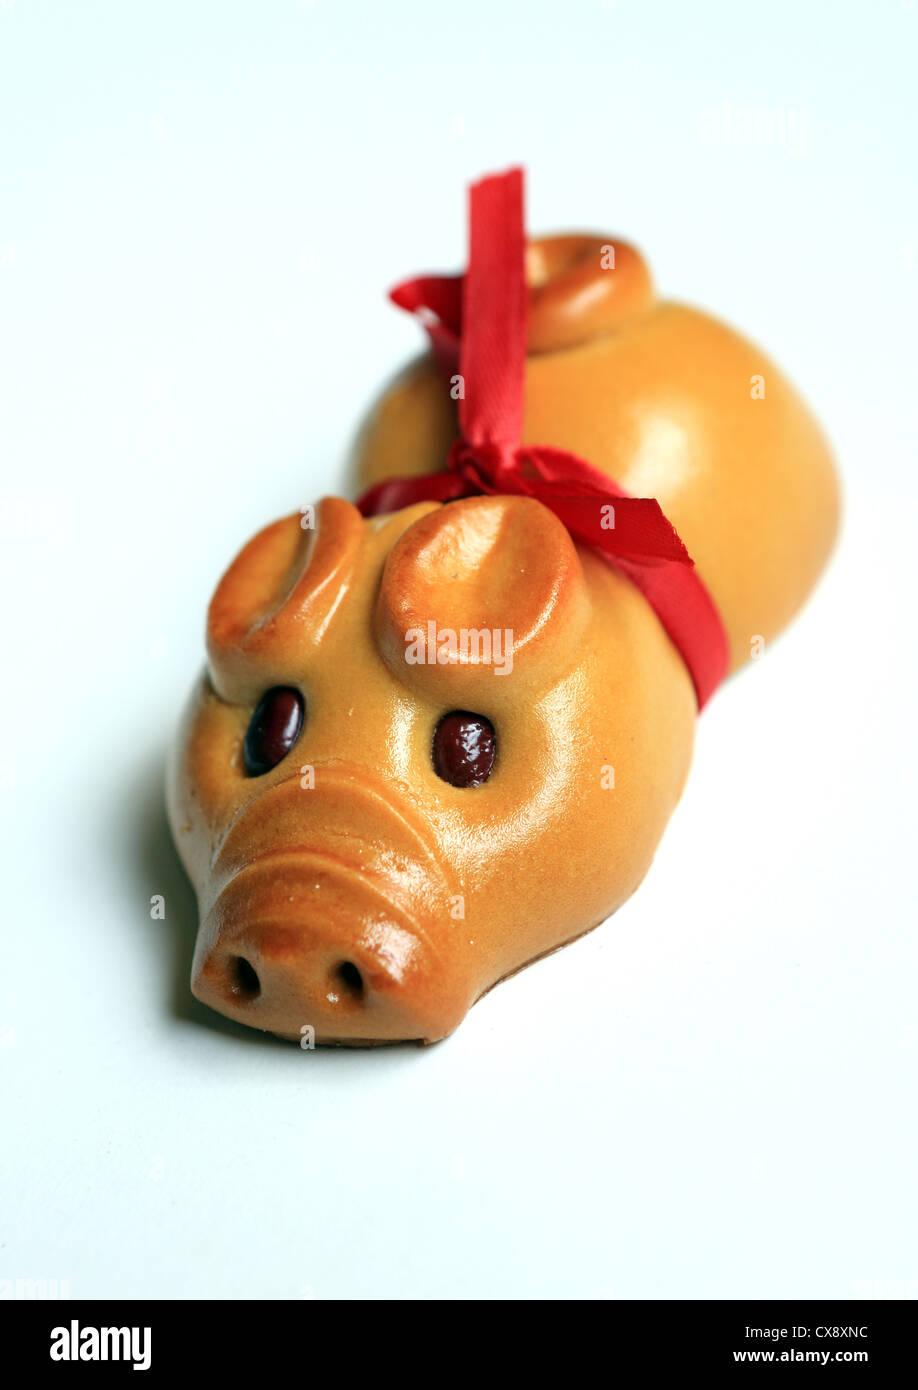 Mooncake in shape of little piggy. - Stock Image